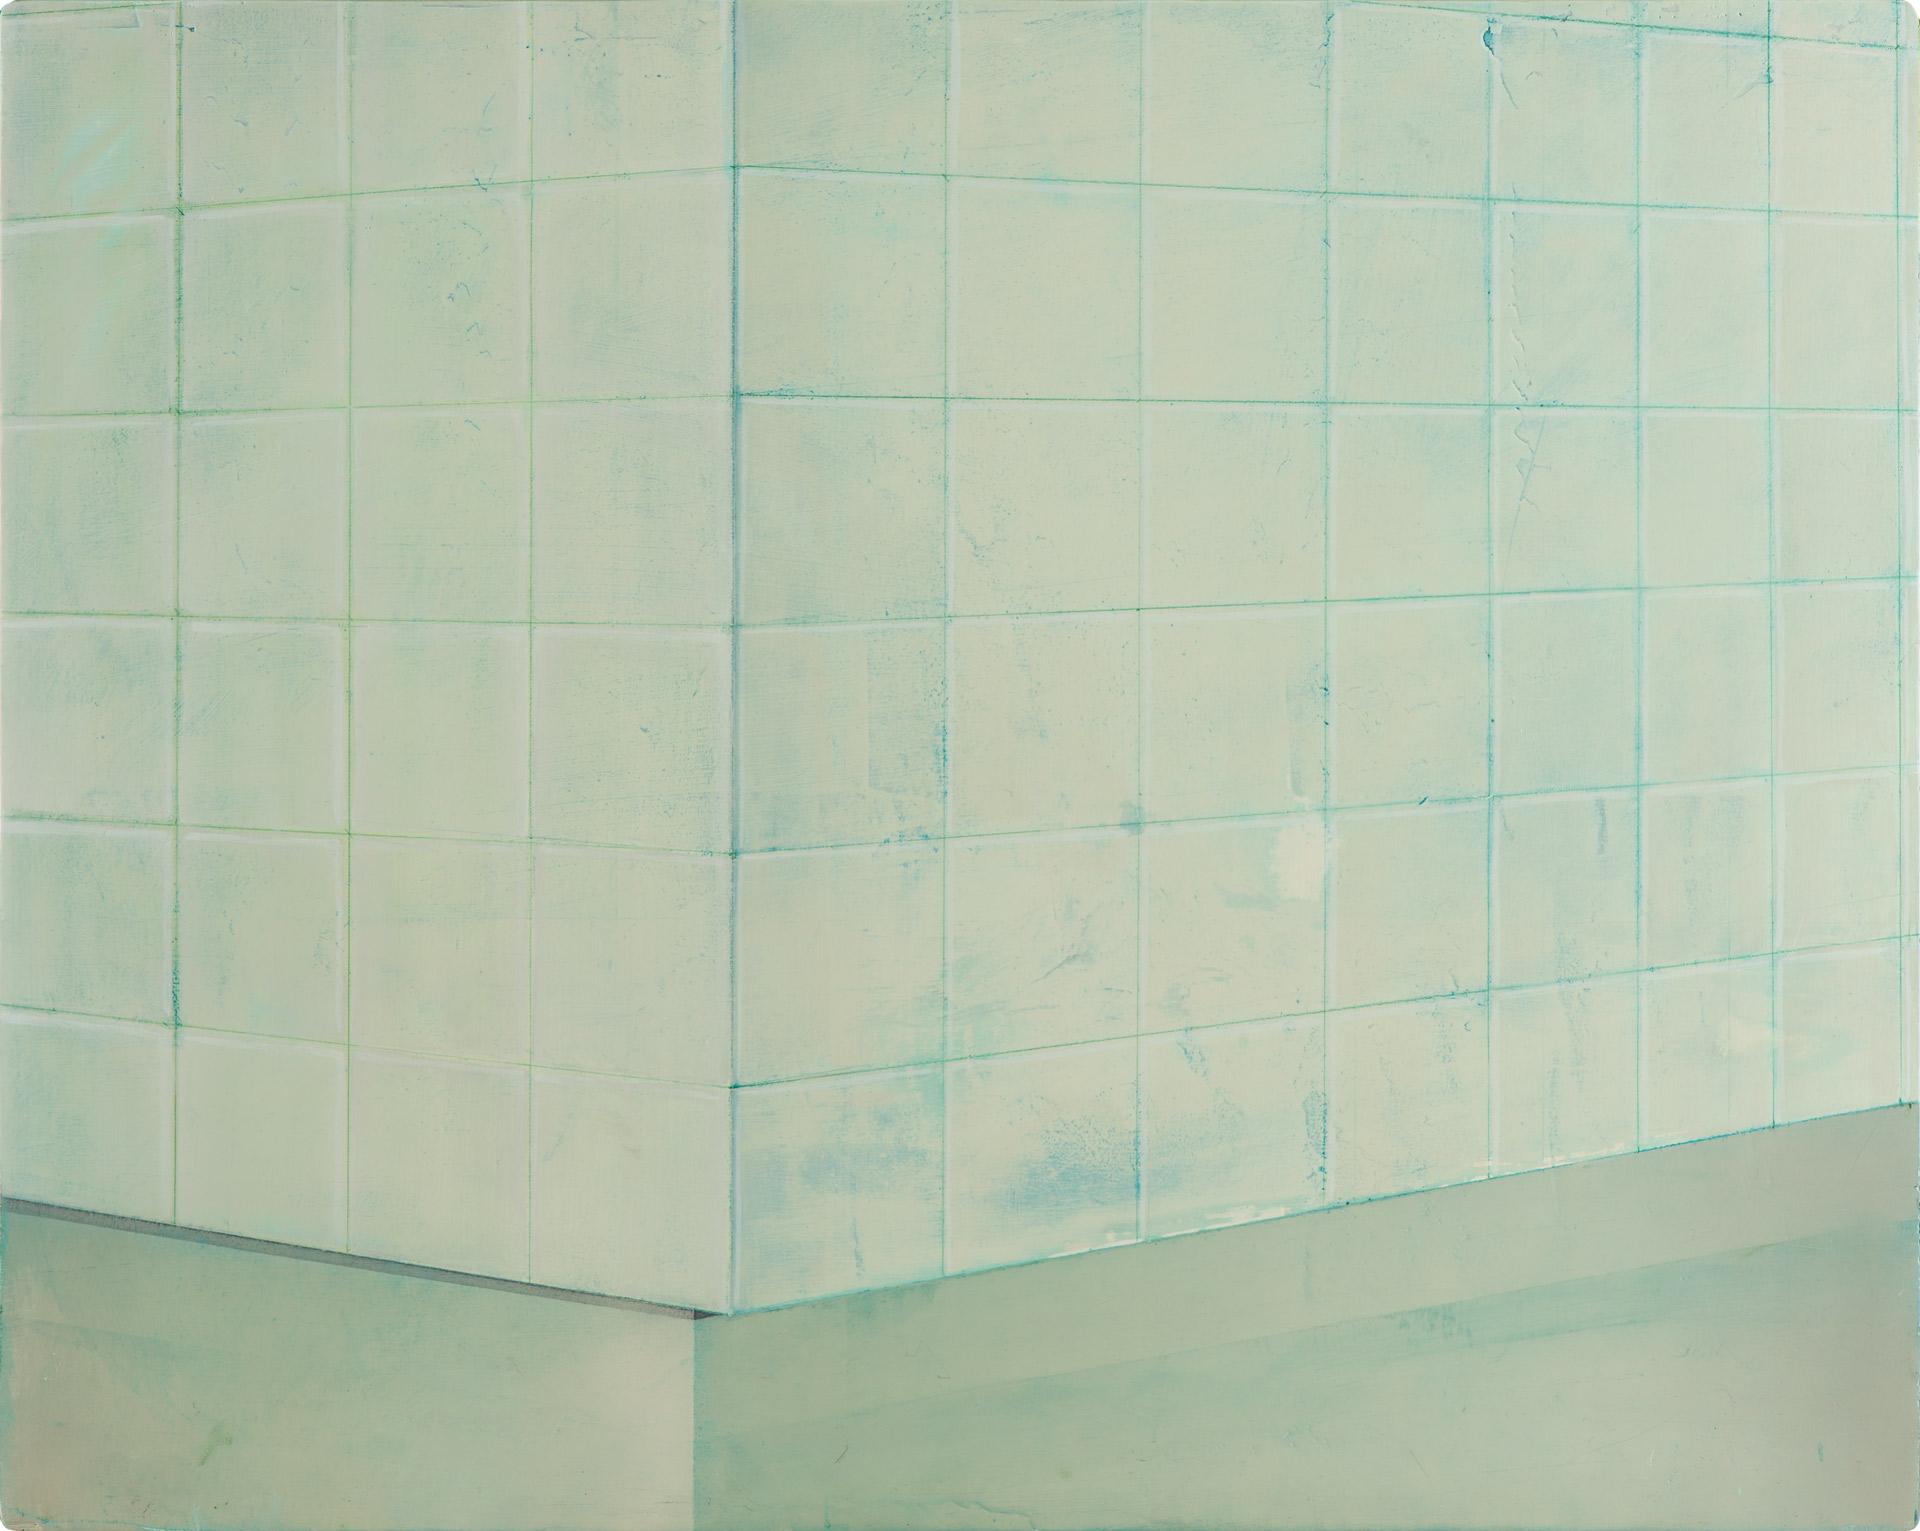 Untitled/50 x 60 cm, Oil on wood/2017